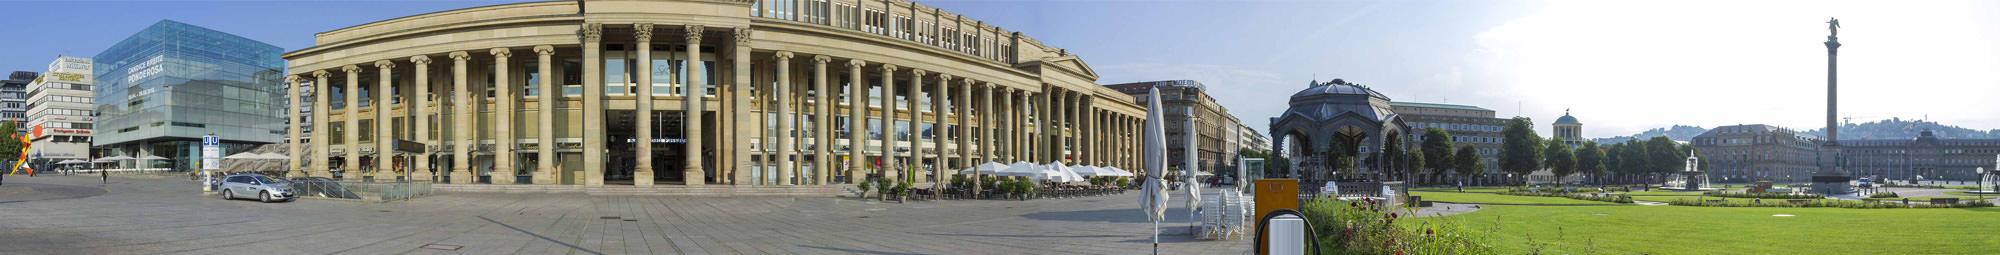 Stuttgart Schlossplatz 360°